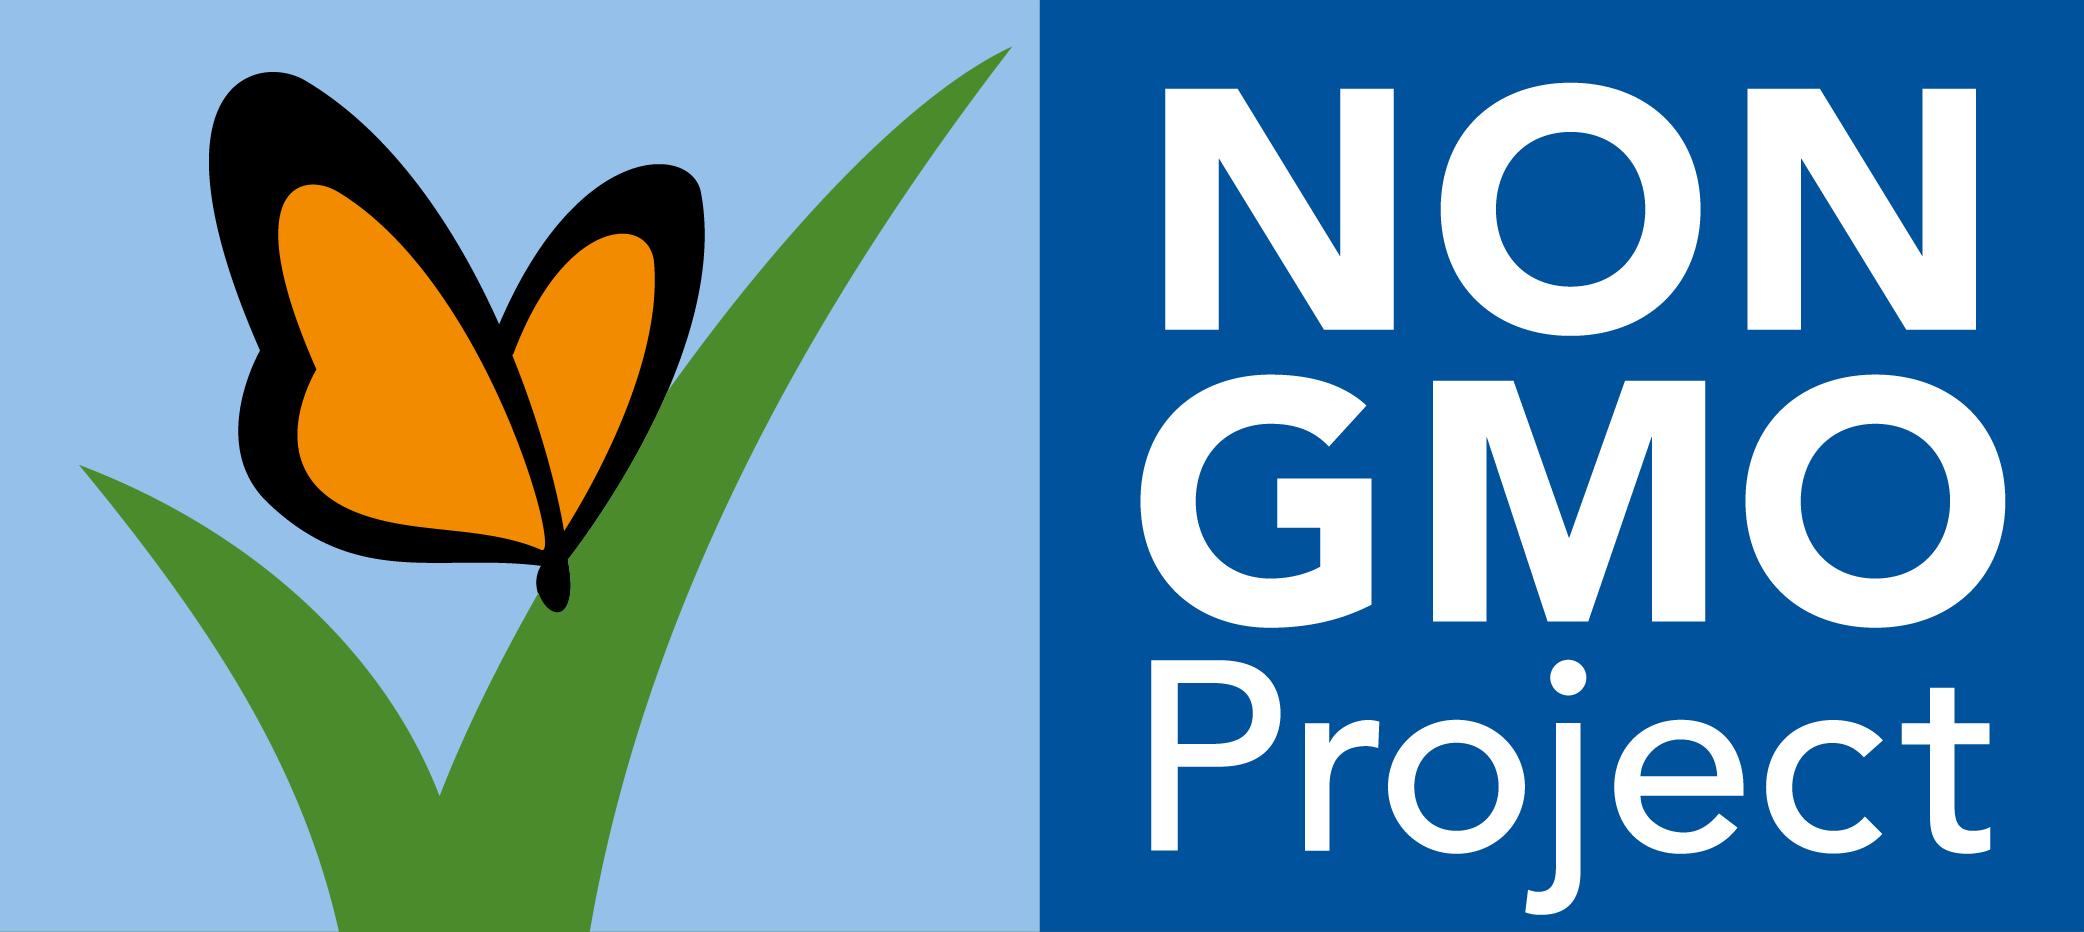 2016-06-29_NGP_web_assets_NGP_web_logo.png